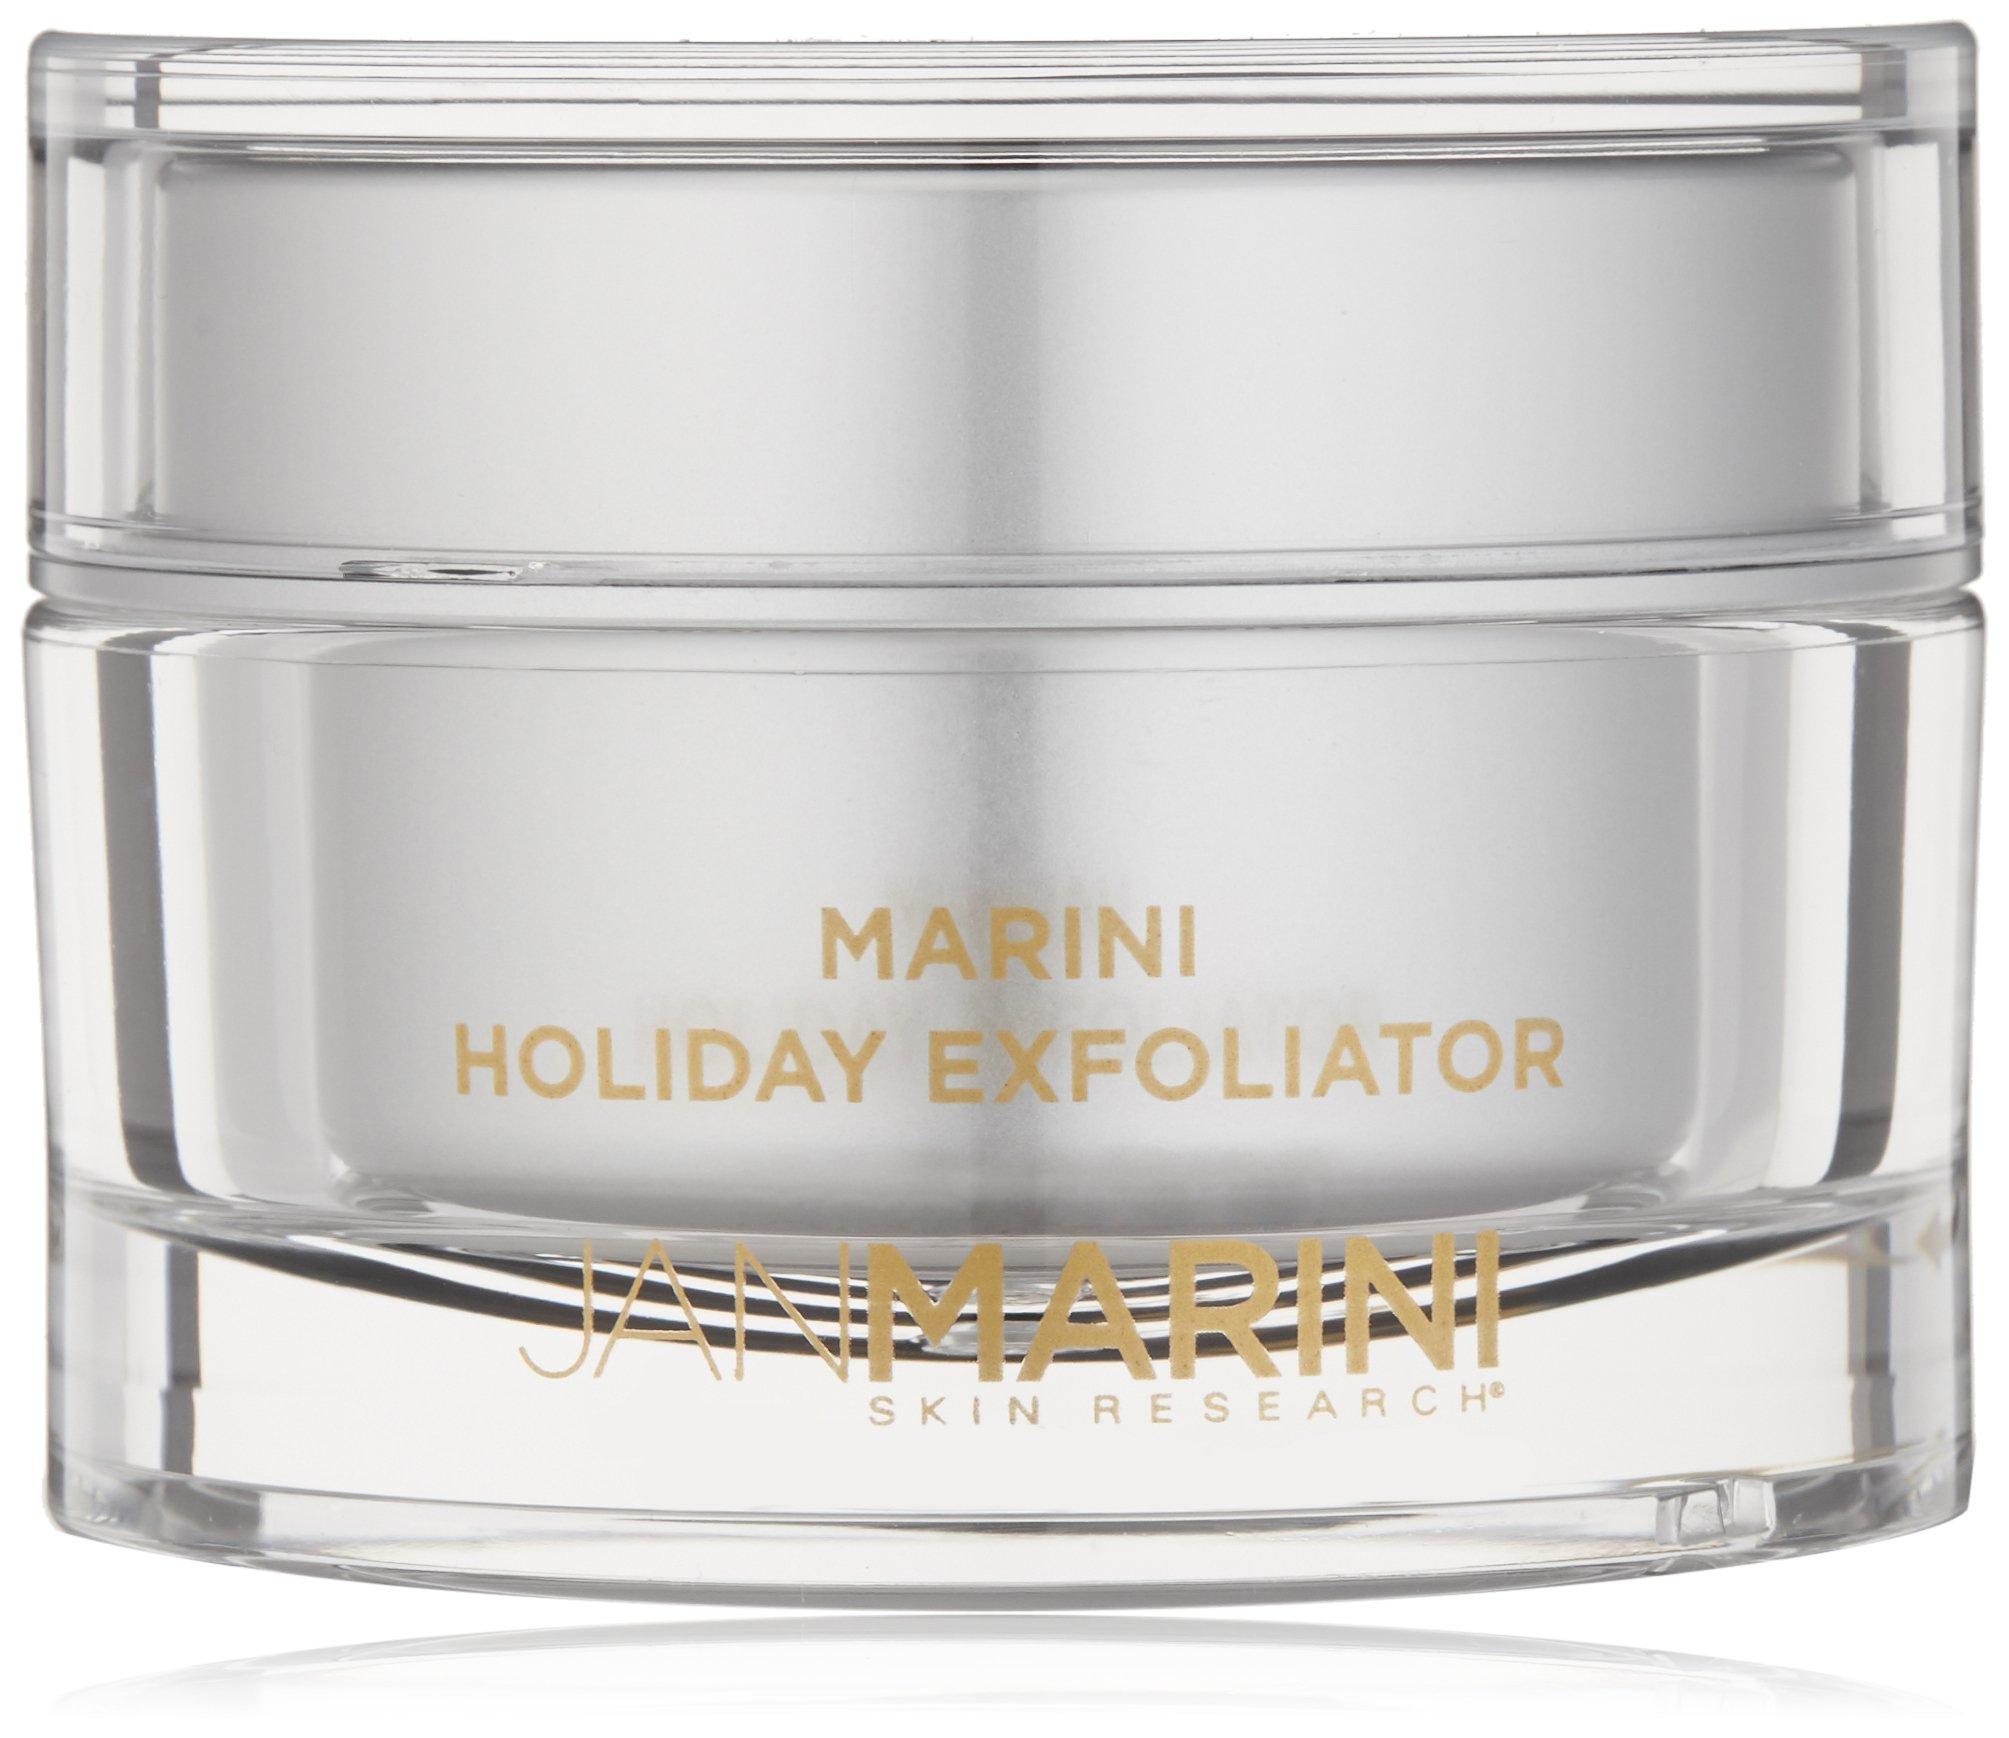 Jan Marini Skin Research Holiday Exfoliator Chocolate Truffle, 2 oz